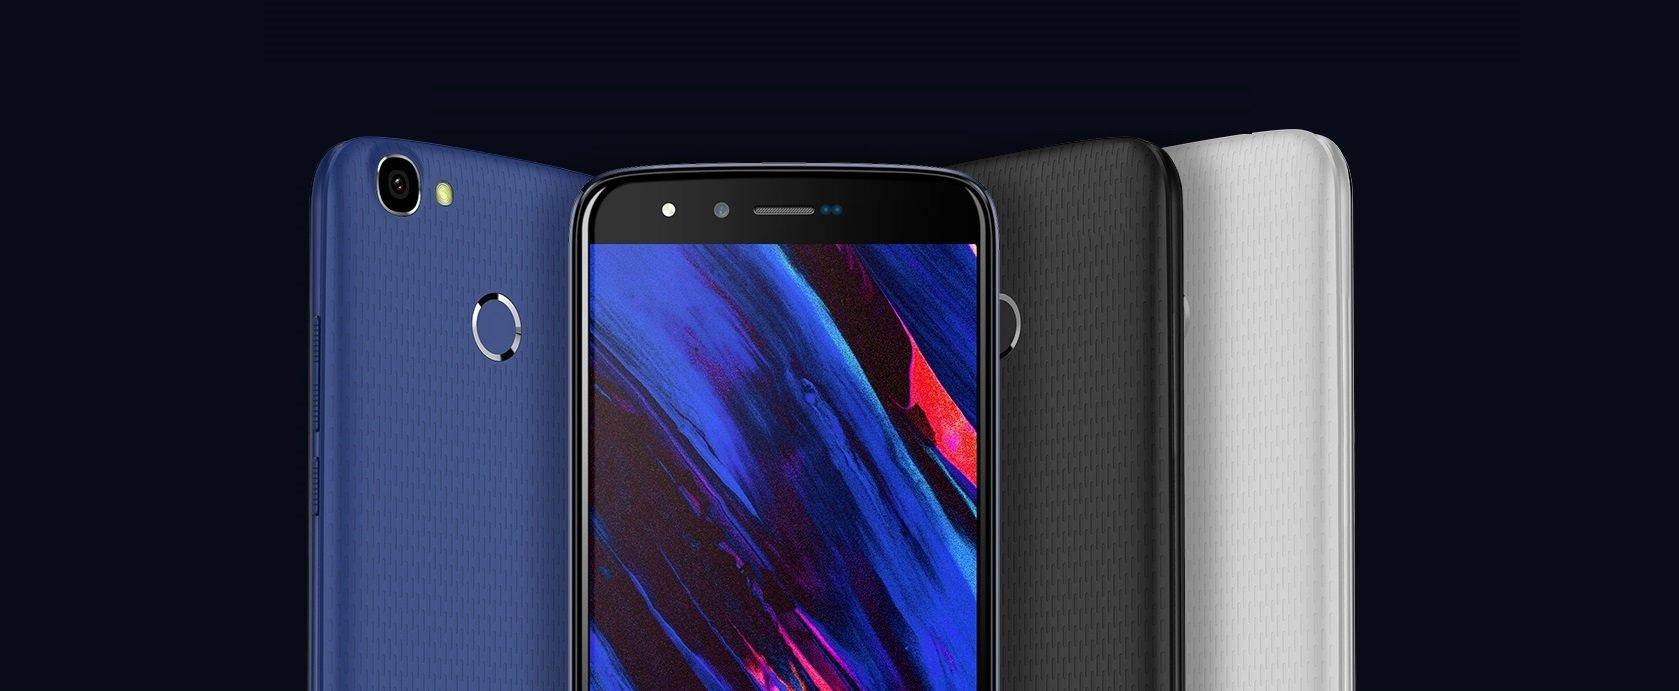 HOMTOM HT50 – najtańszy smartfon z baterią o pojemności 5500 mAh